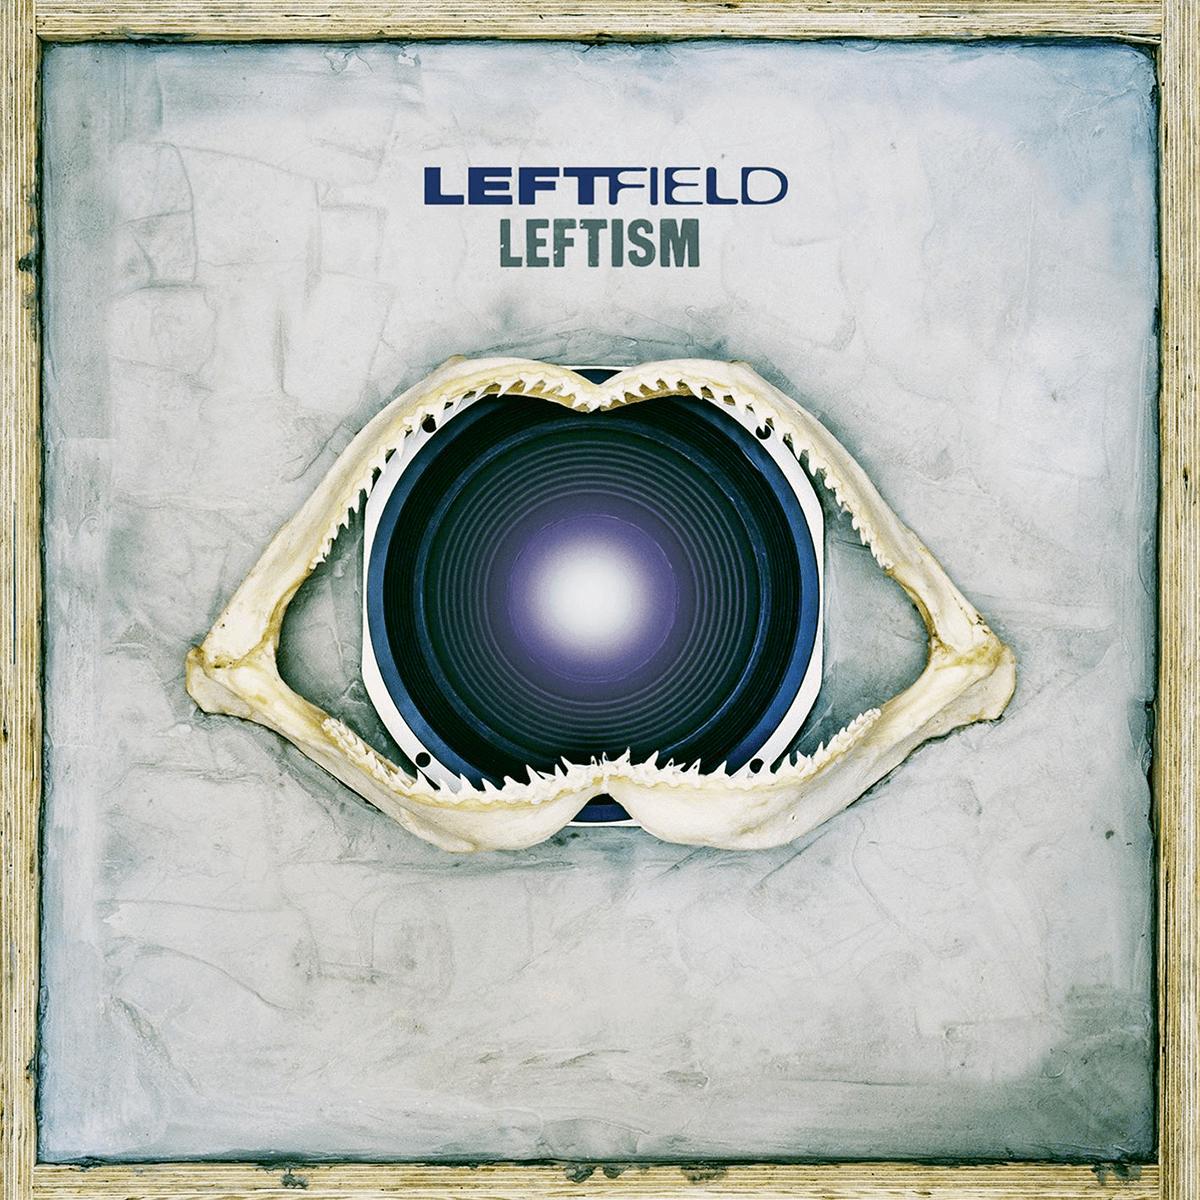 Leftfield的首張專集《Leftism》今年剛好二十五周年